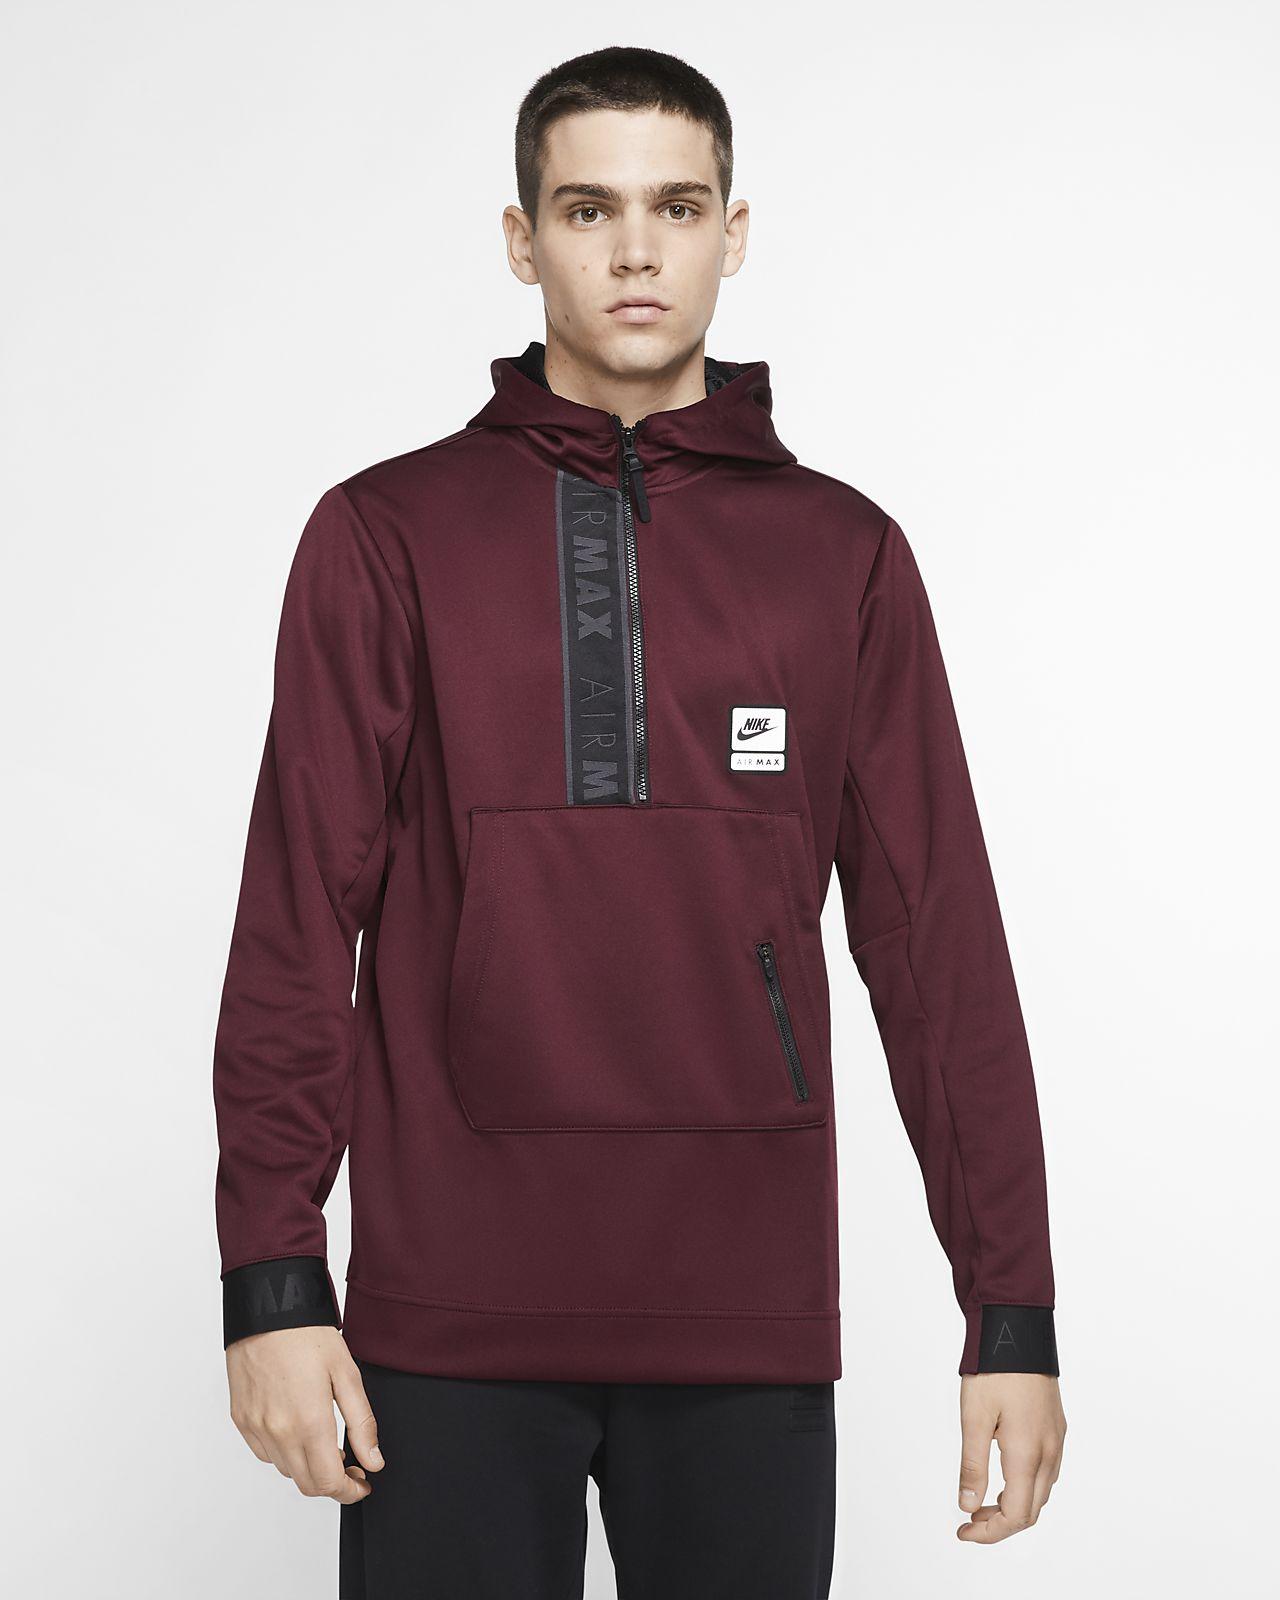 Мужская худи с молнией на половину длины Nike Sportswear Air Max